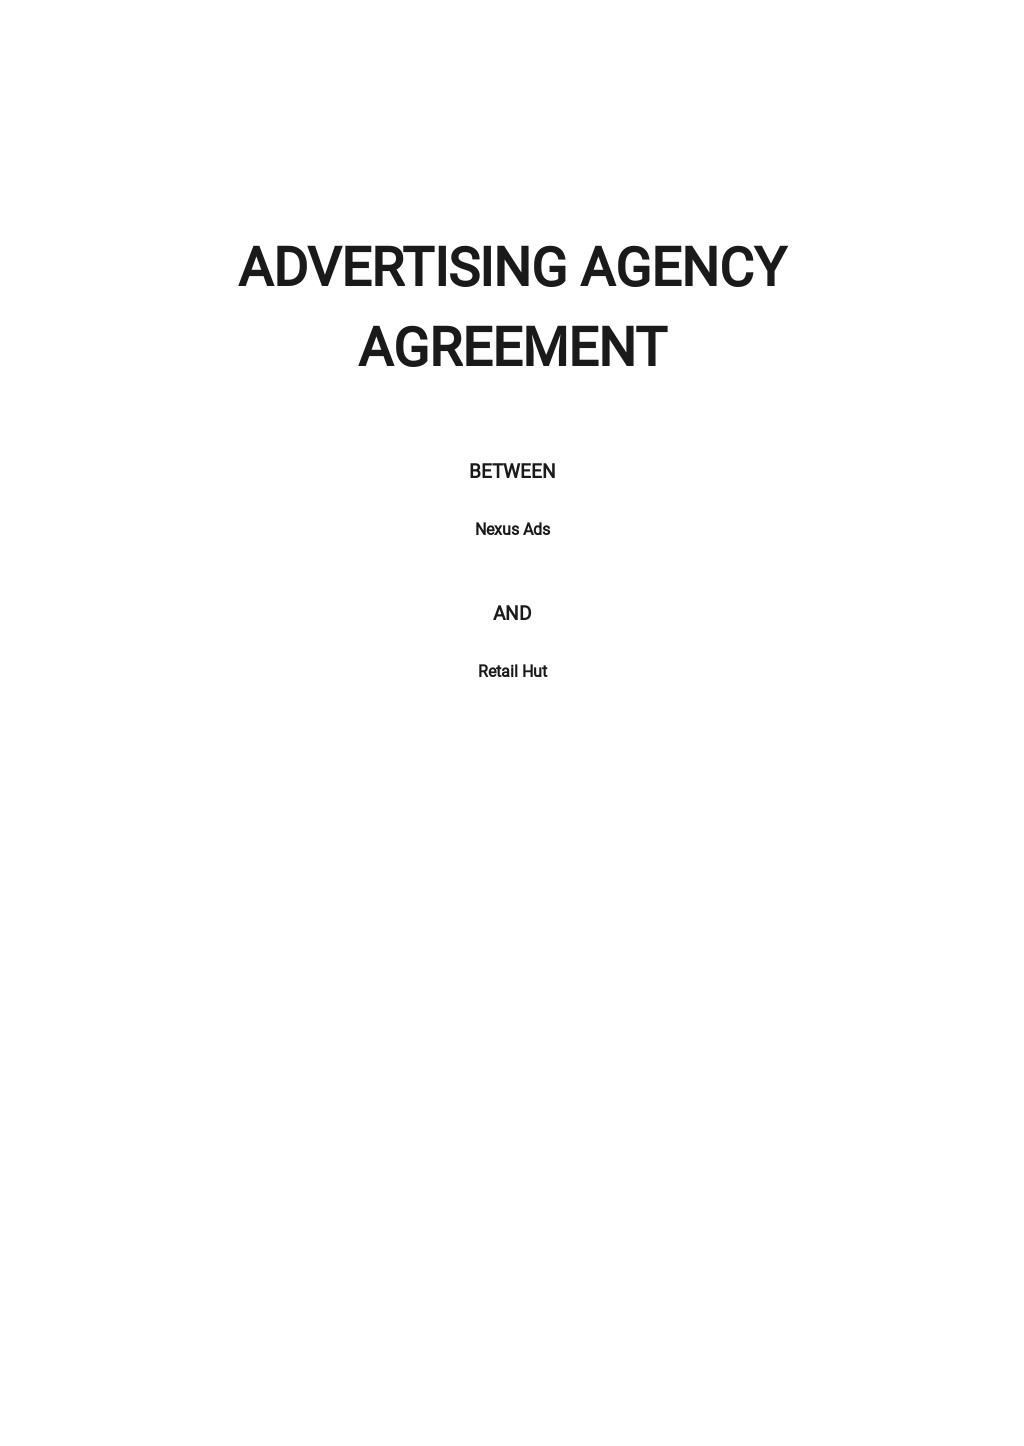 Free Sample Advertising Agency Agreement Template.jpe